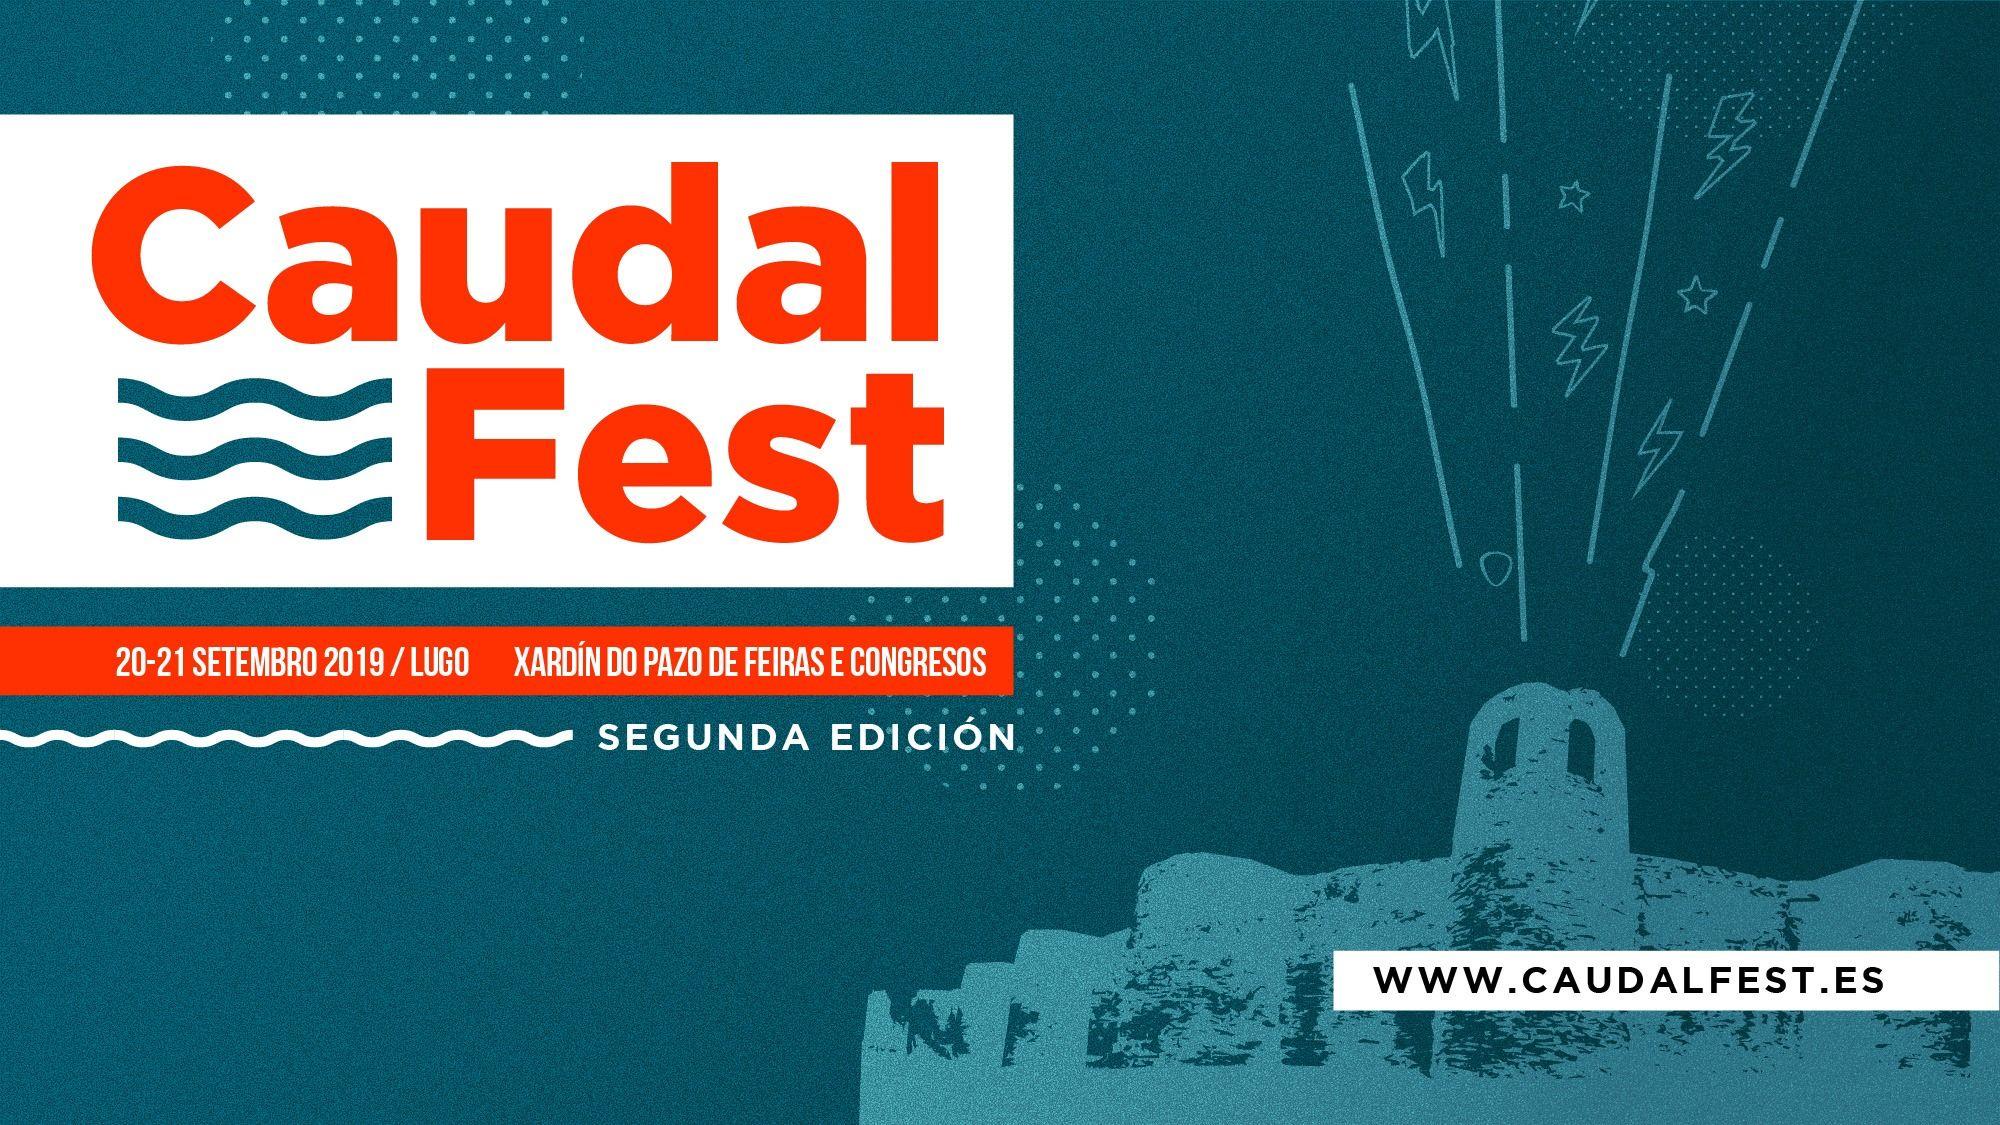 Caudal Fest, 'el útlimo gran festival del verano'